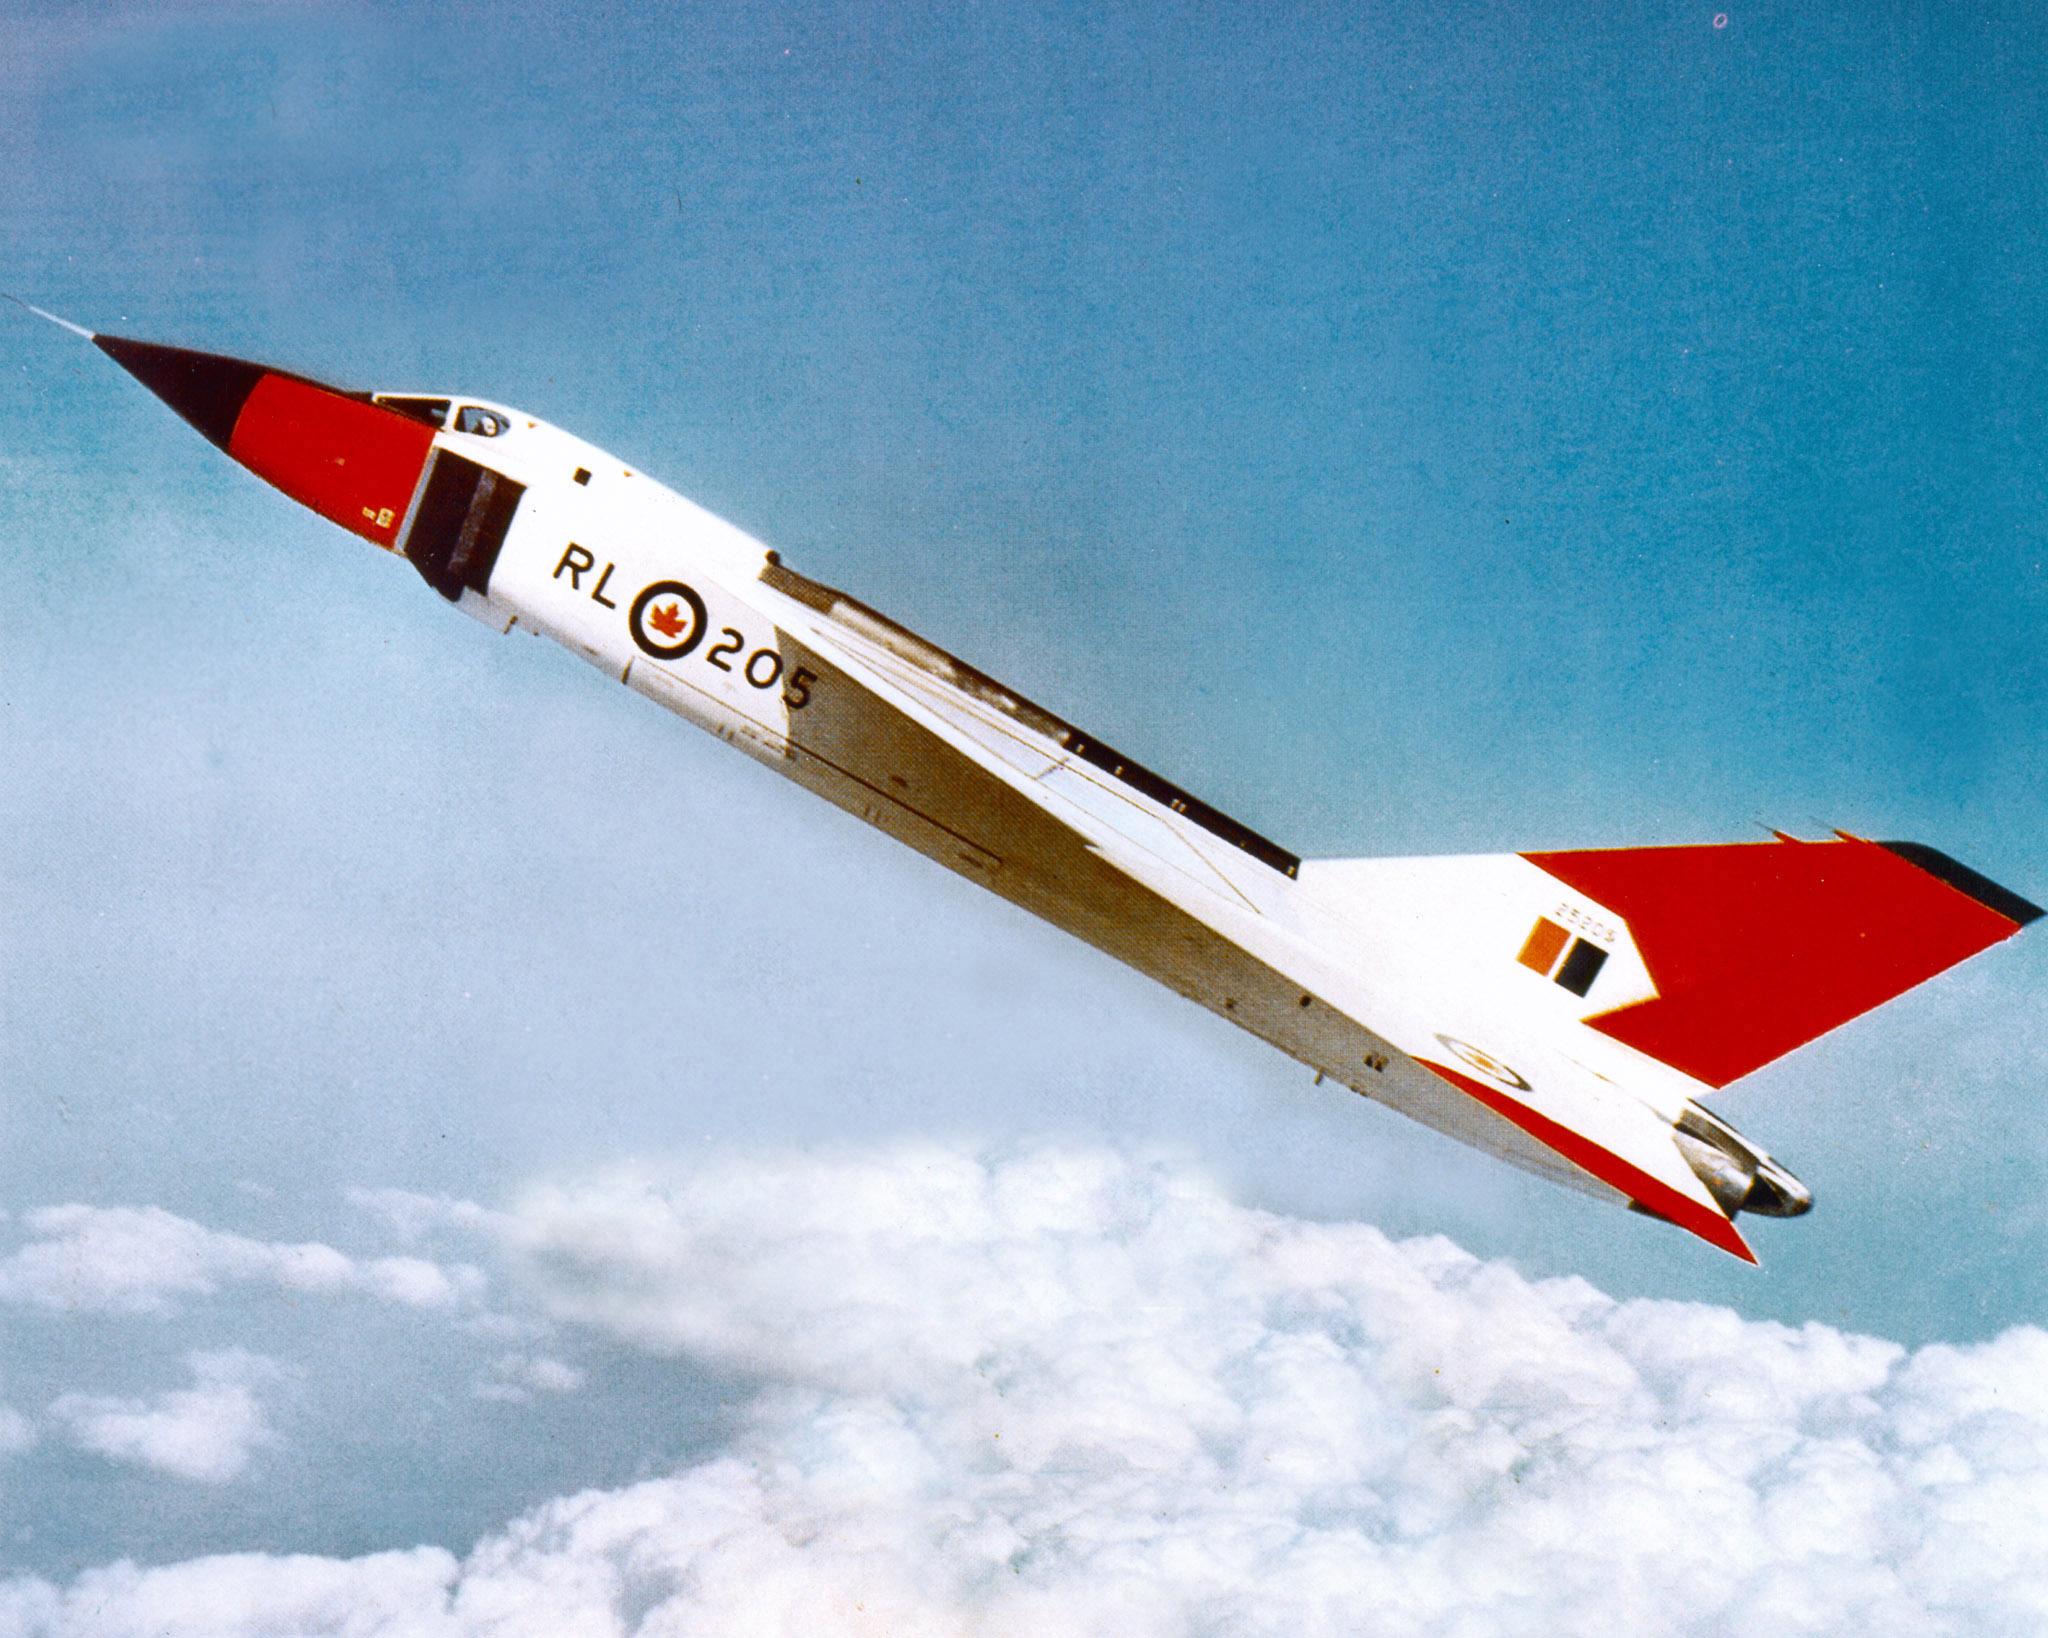 Video: Avro Arrow model found in Lake Ontario | WOSU Radio